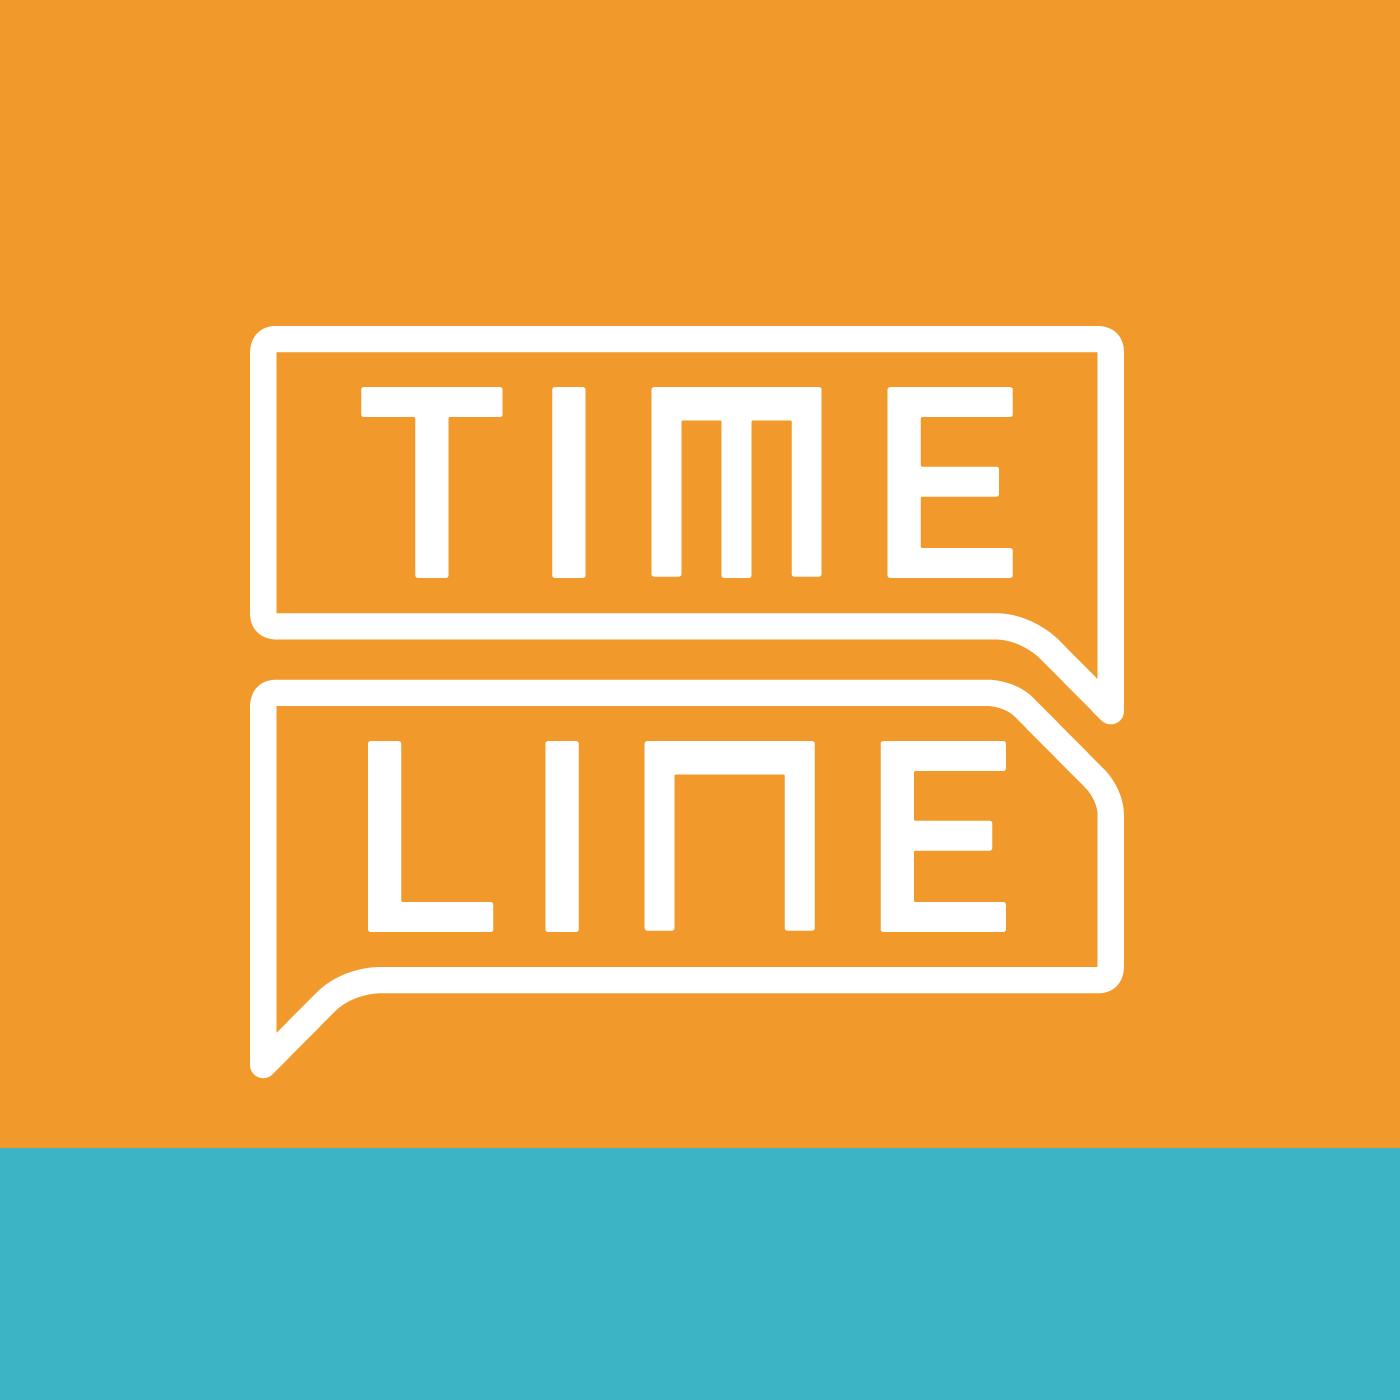 Timeline Gaúcha 25/09/2017